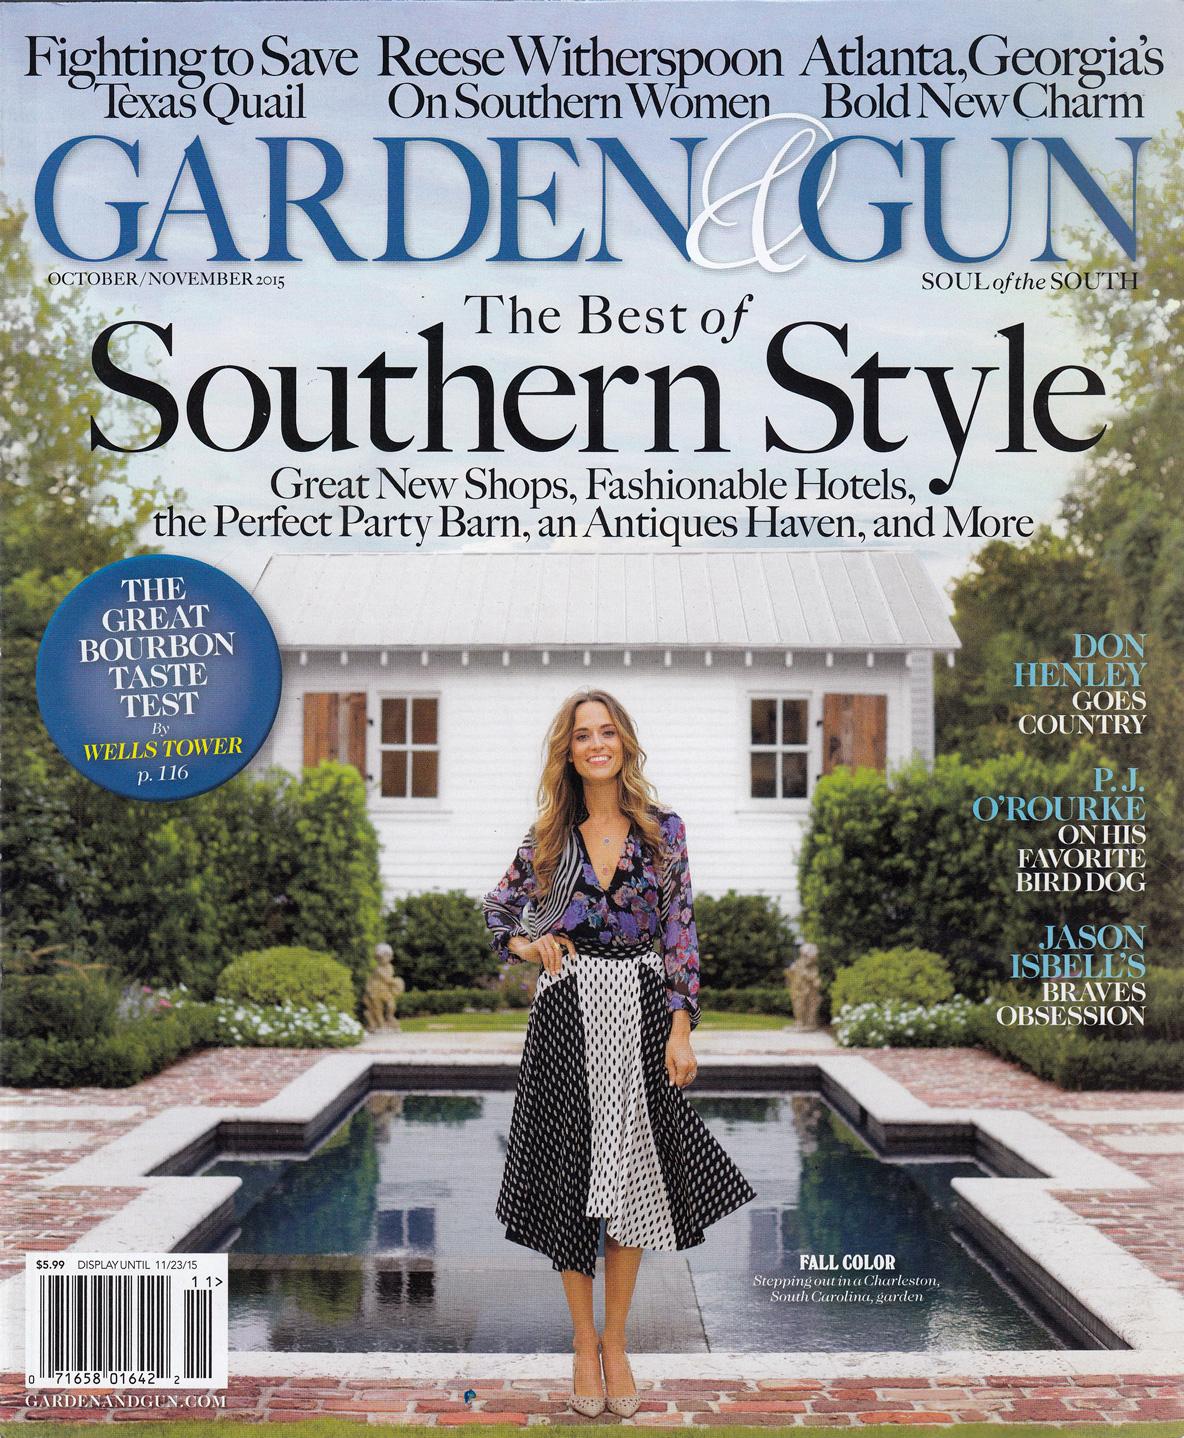 Garden-&-Gun-2015-10-11_01w.jpg